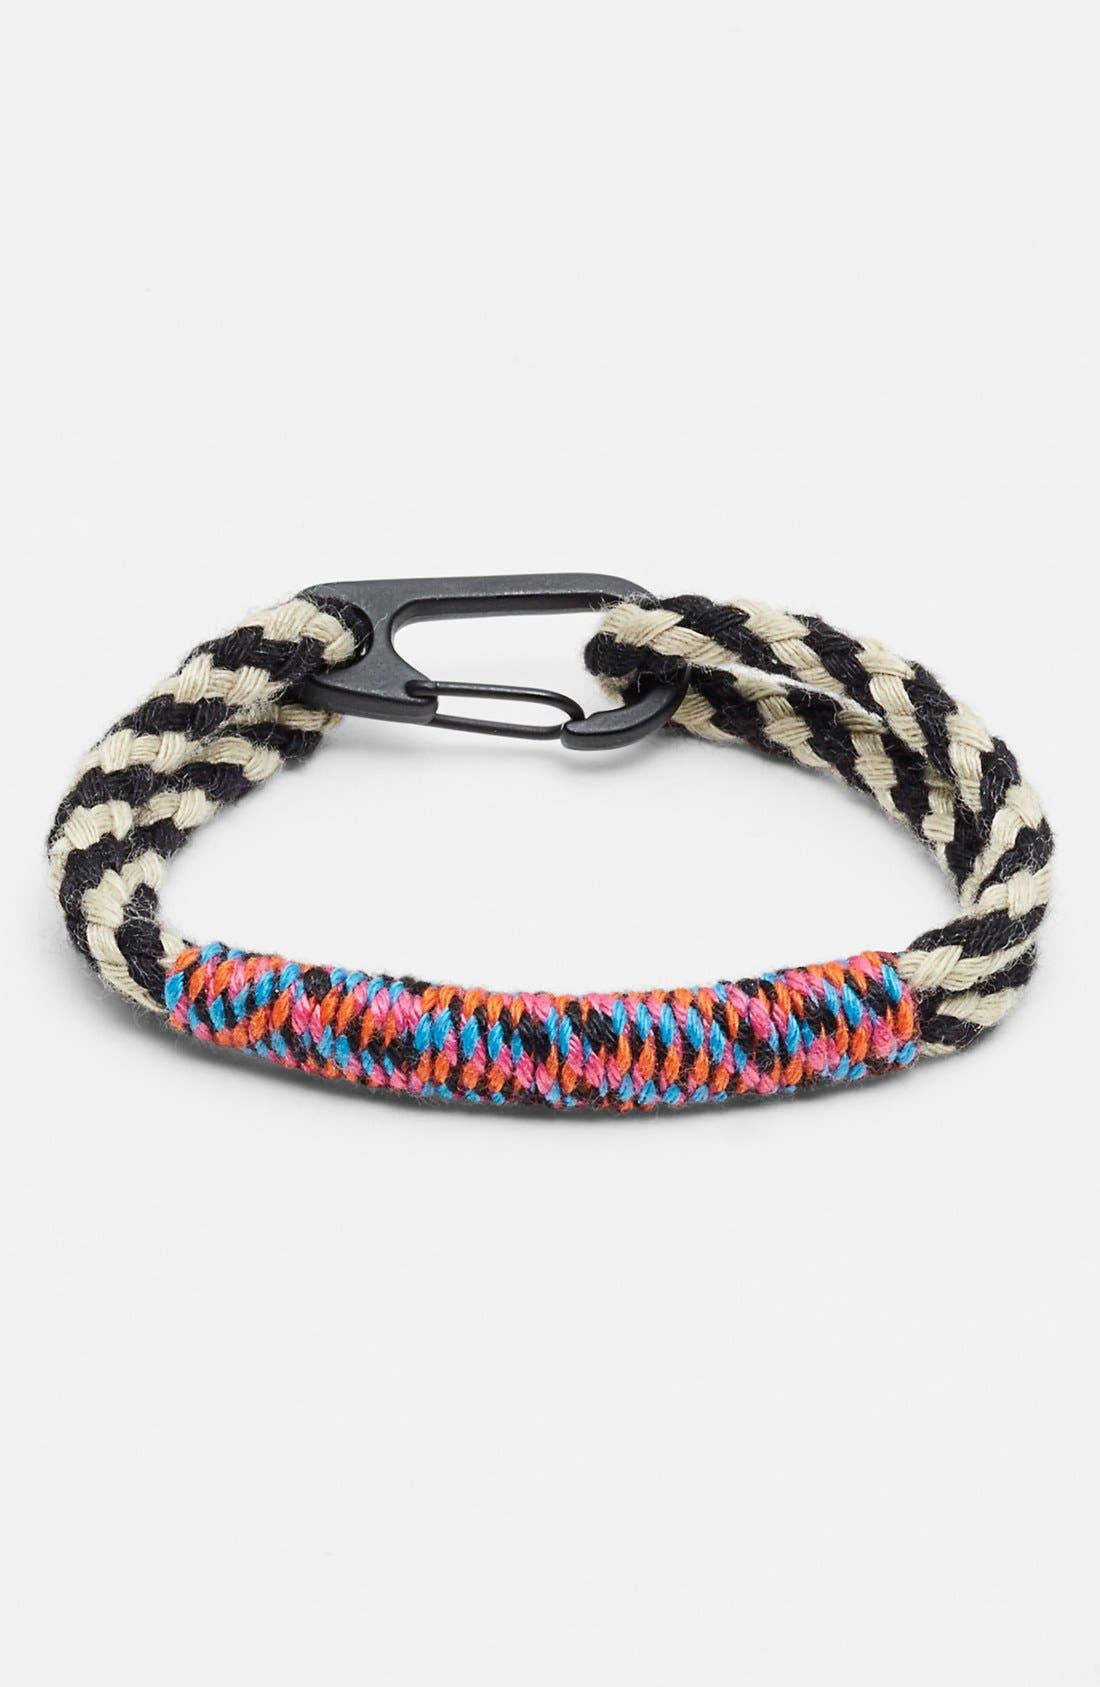 Main Image - Cara Couture 'Bungee' Bracelet